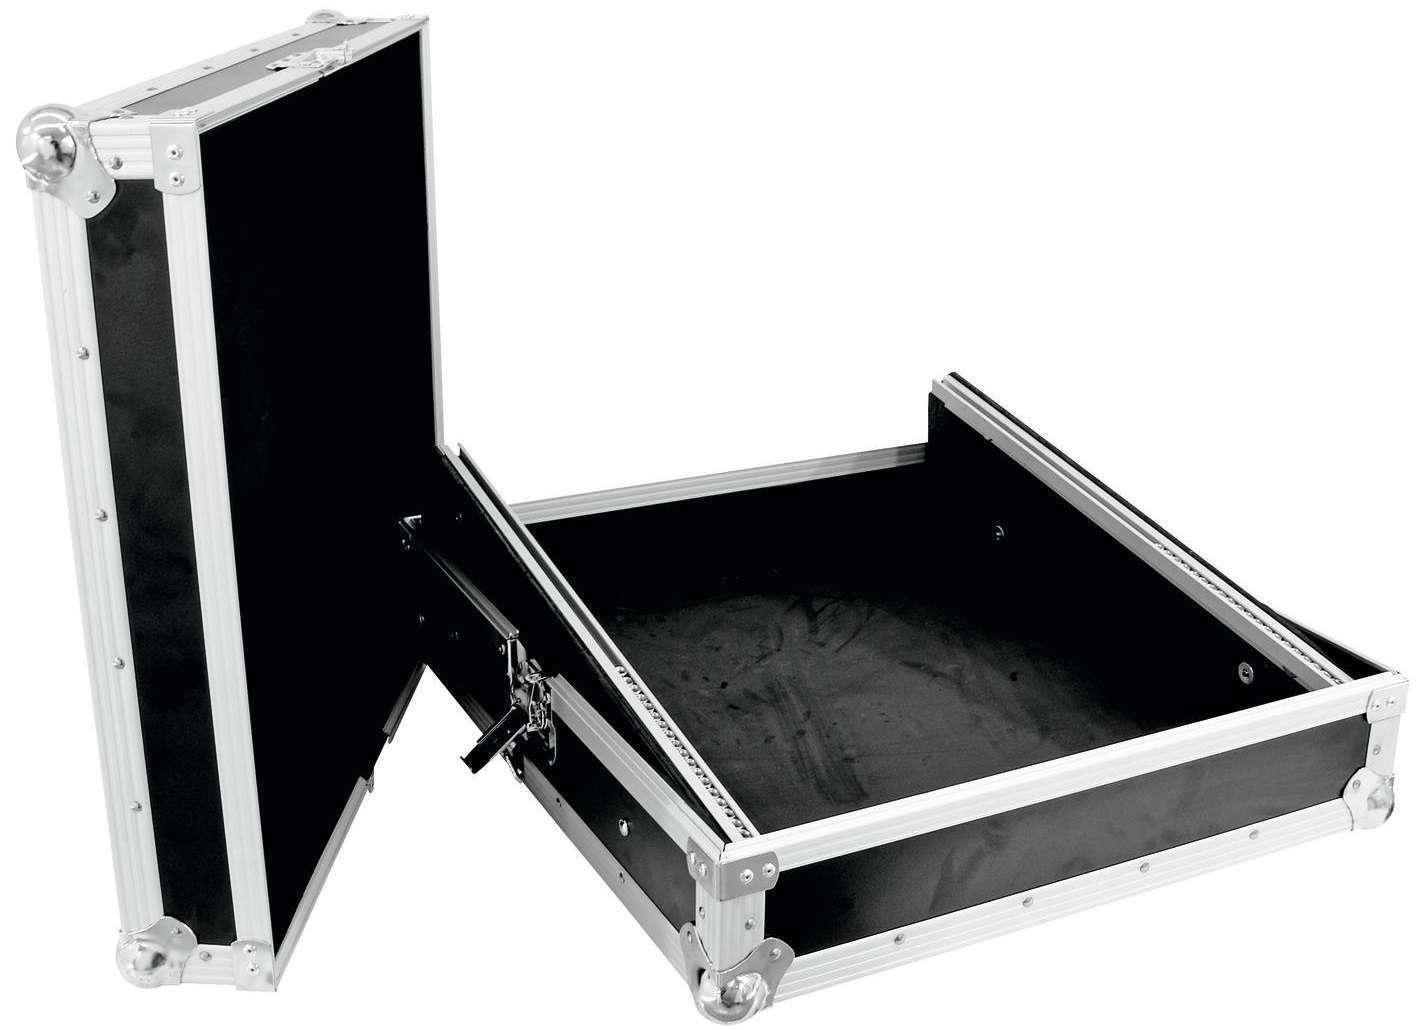 12 HE 19  PROFI Mixercase Mischpultcase Mischercase Lichtcontroller Mixer Case